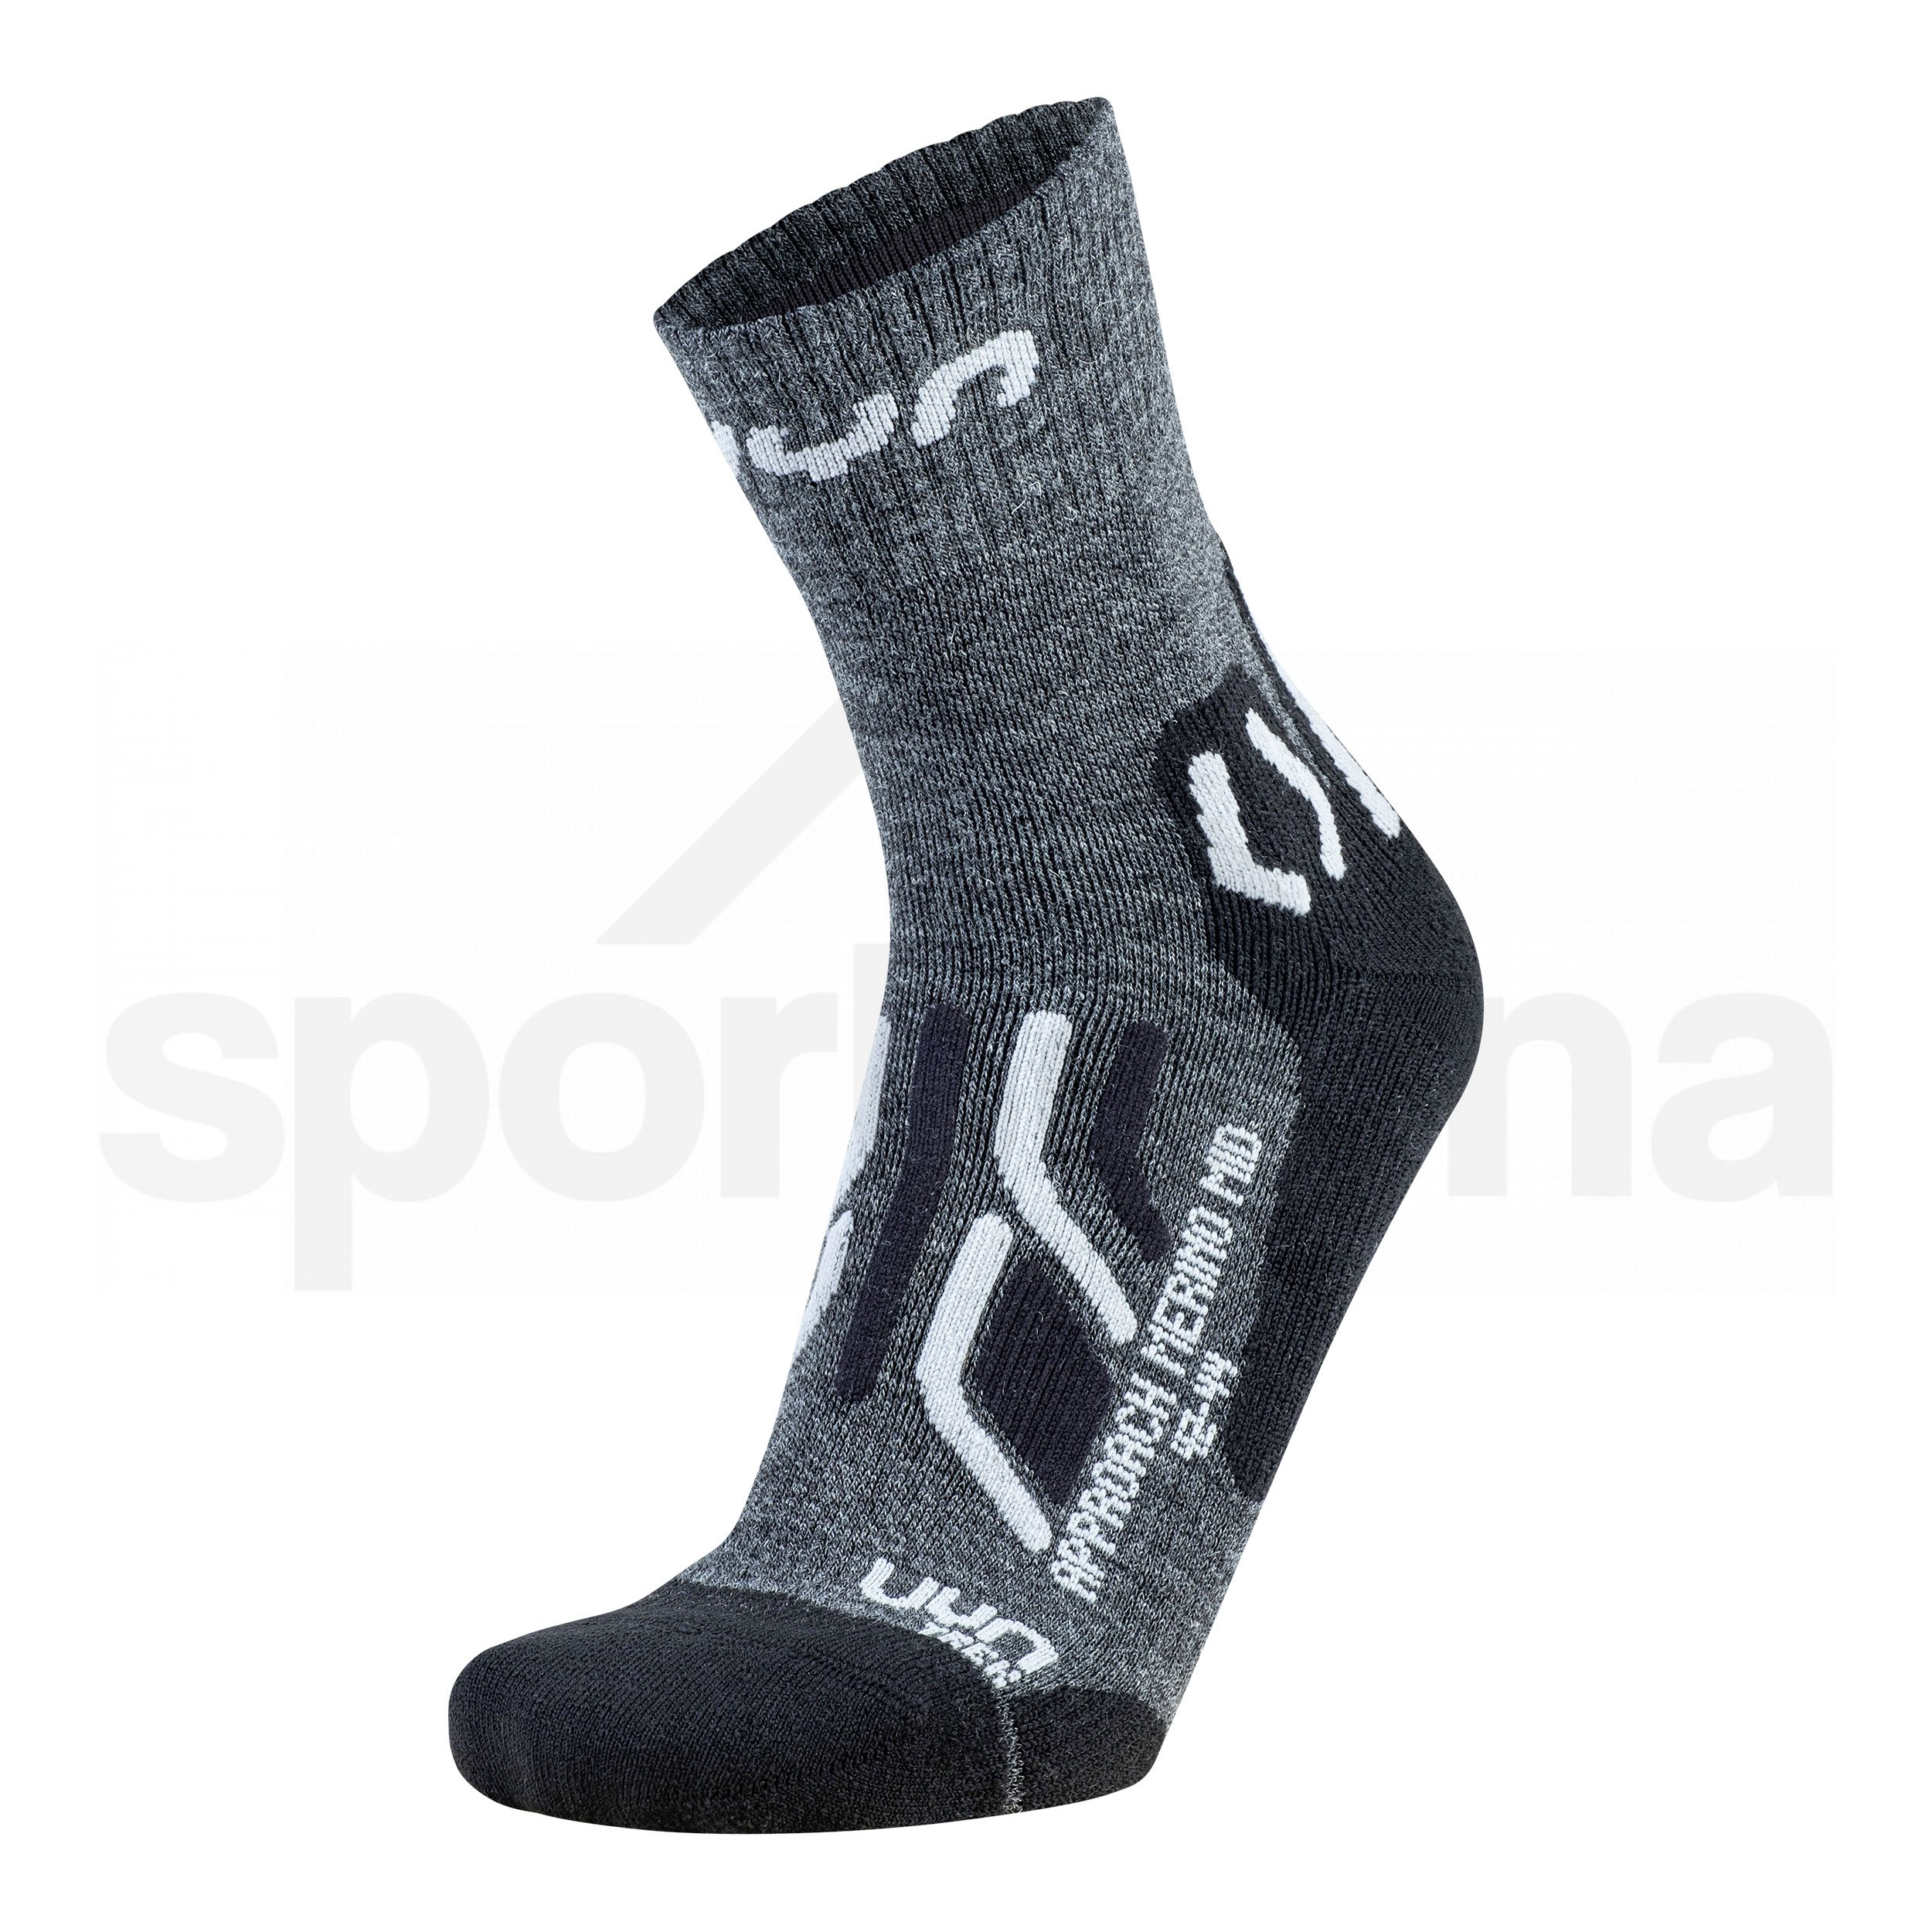 Dámské ponožky UYN TREKKING APPROACH MERINO MID SOCKS S100203G035 - anthracite/black